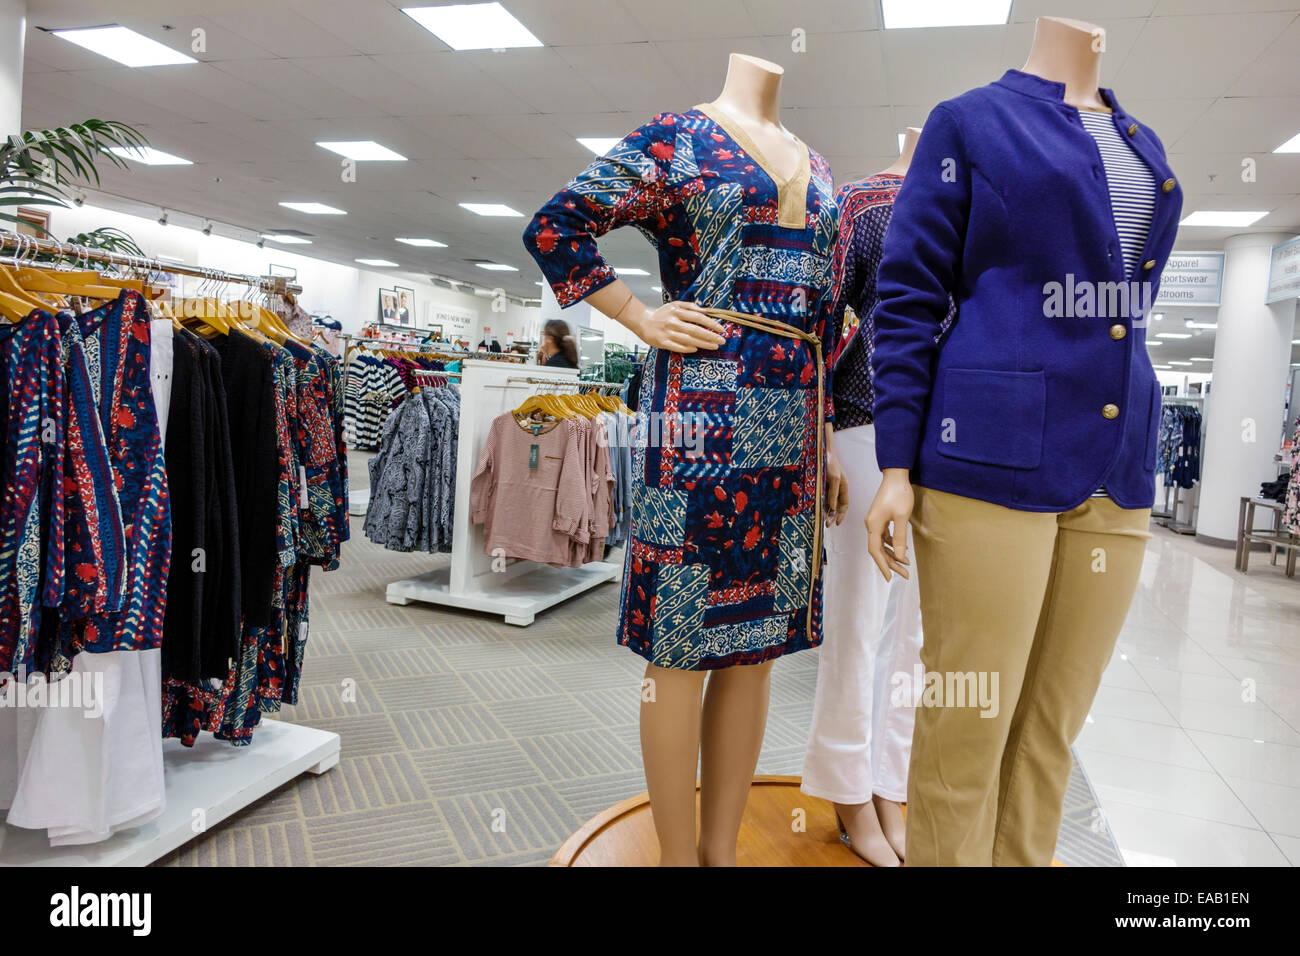 7a1d0415def Mannequin Clothing Stores Photos   Mannequin Clothing Stores Images ...